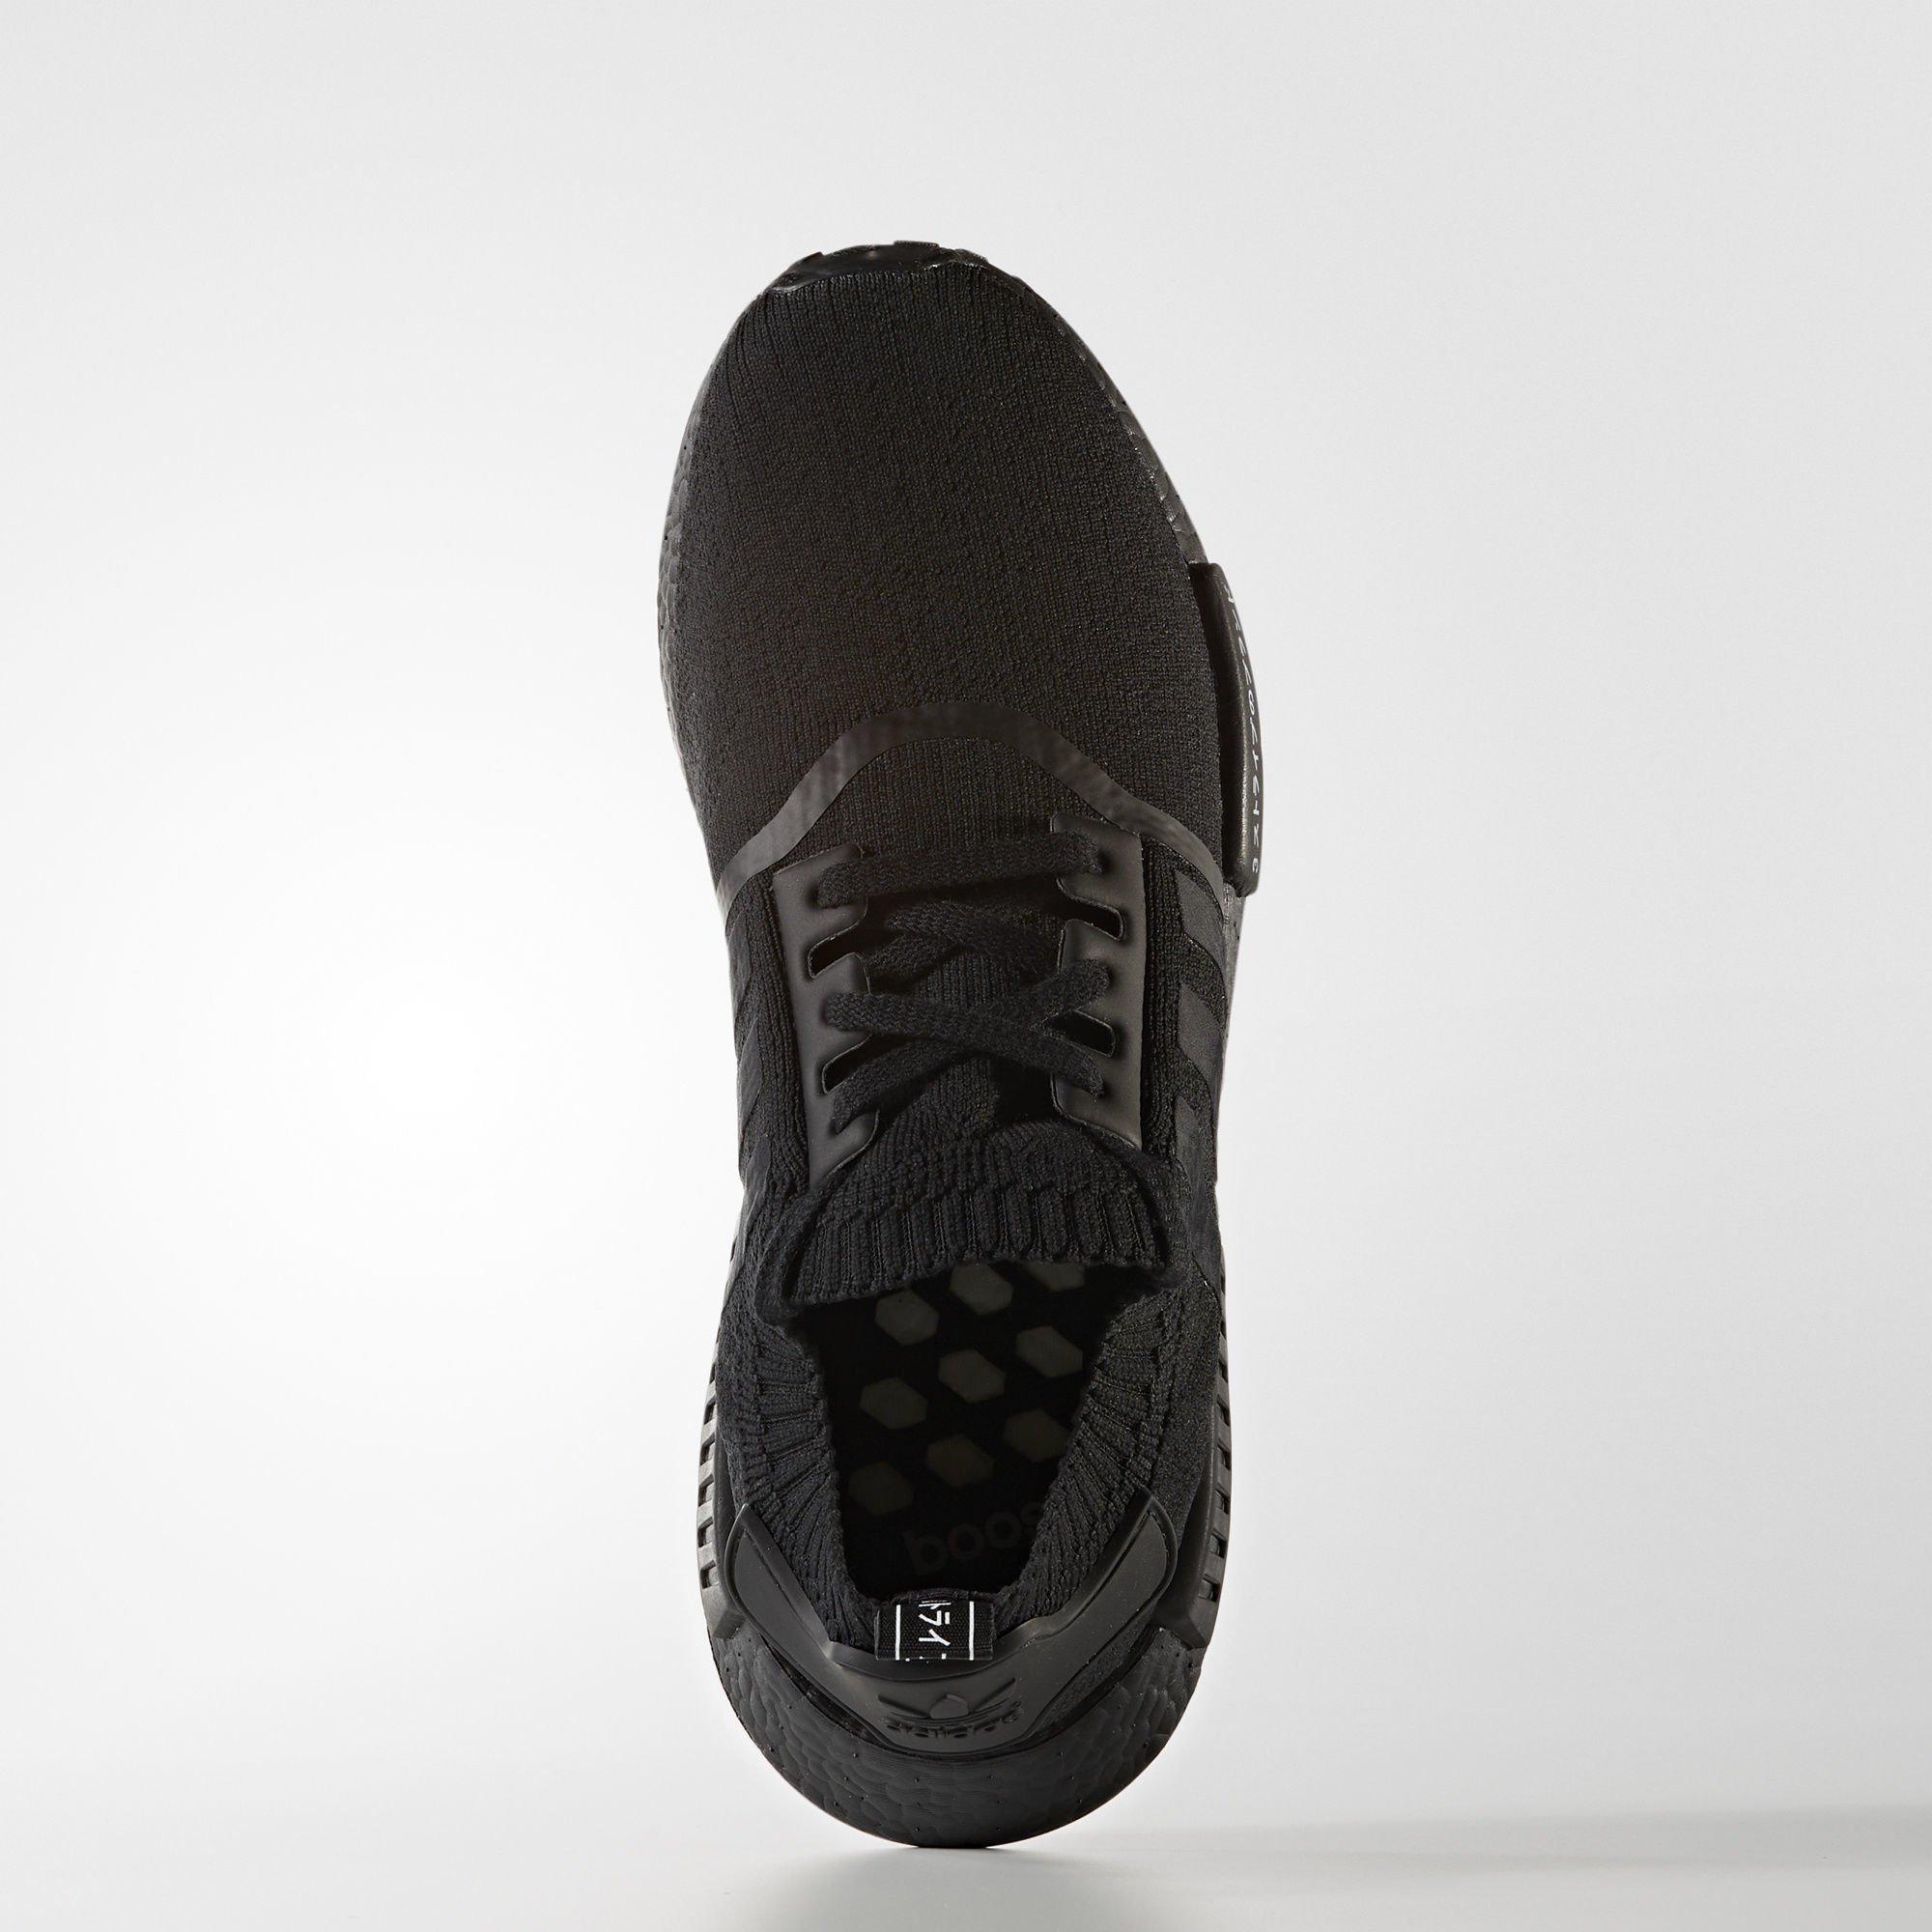 Adidas NMD R1 BZ0220